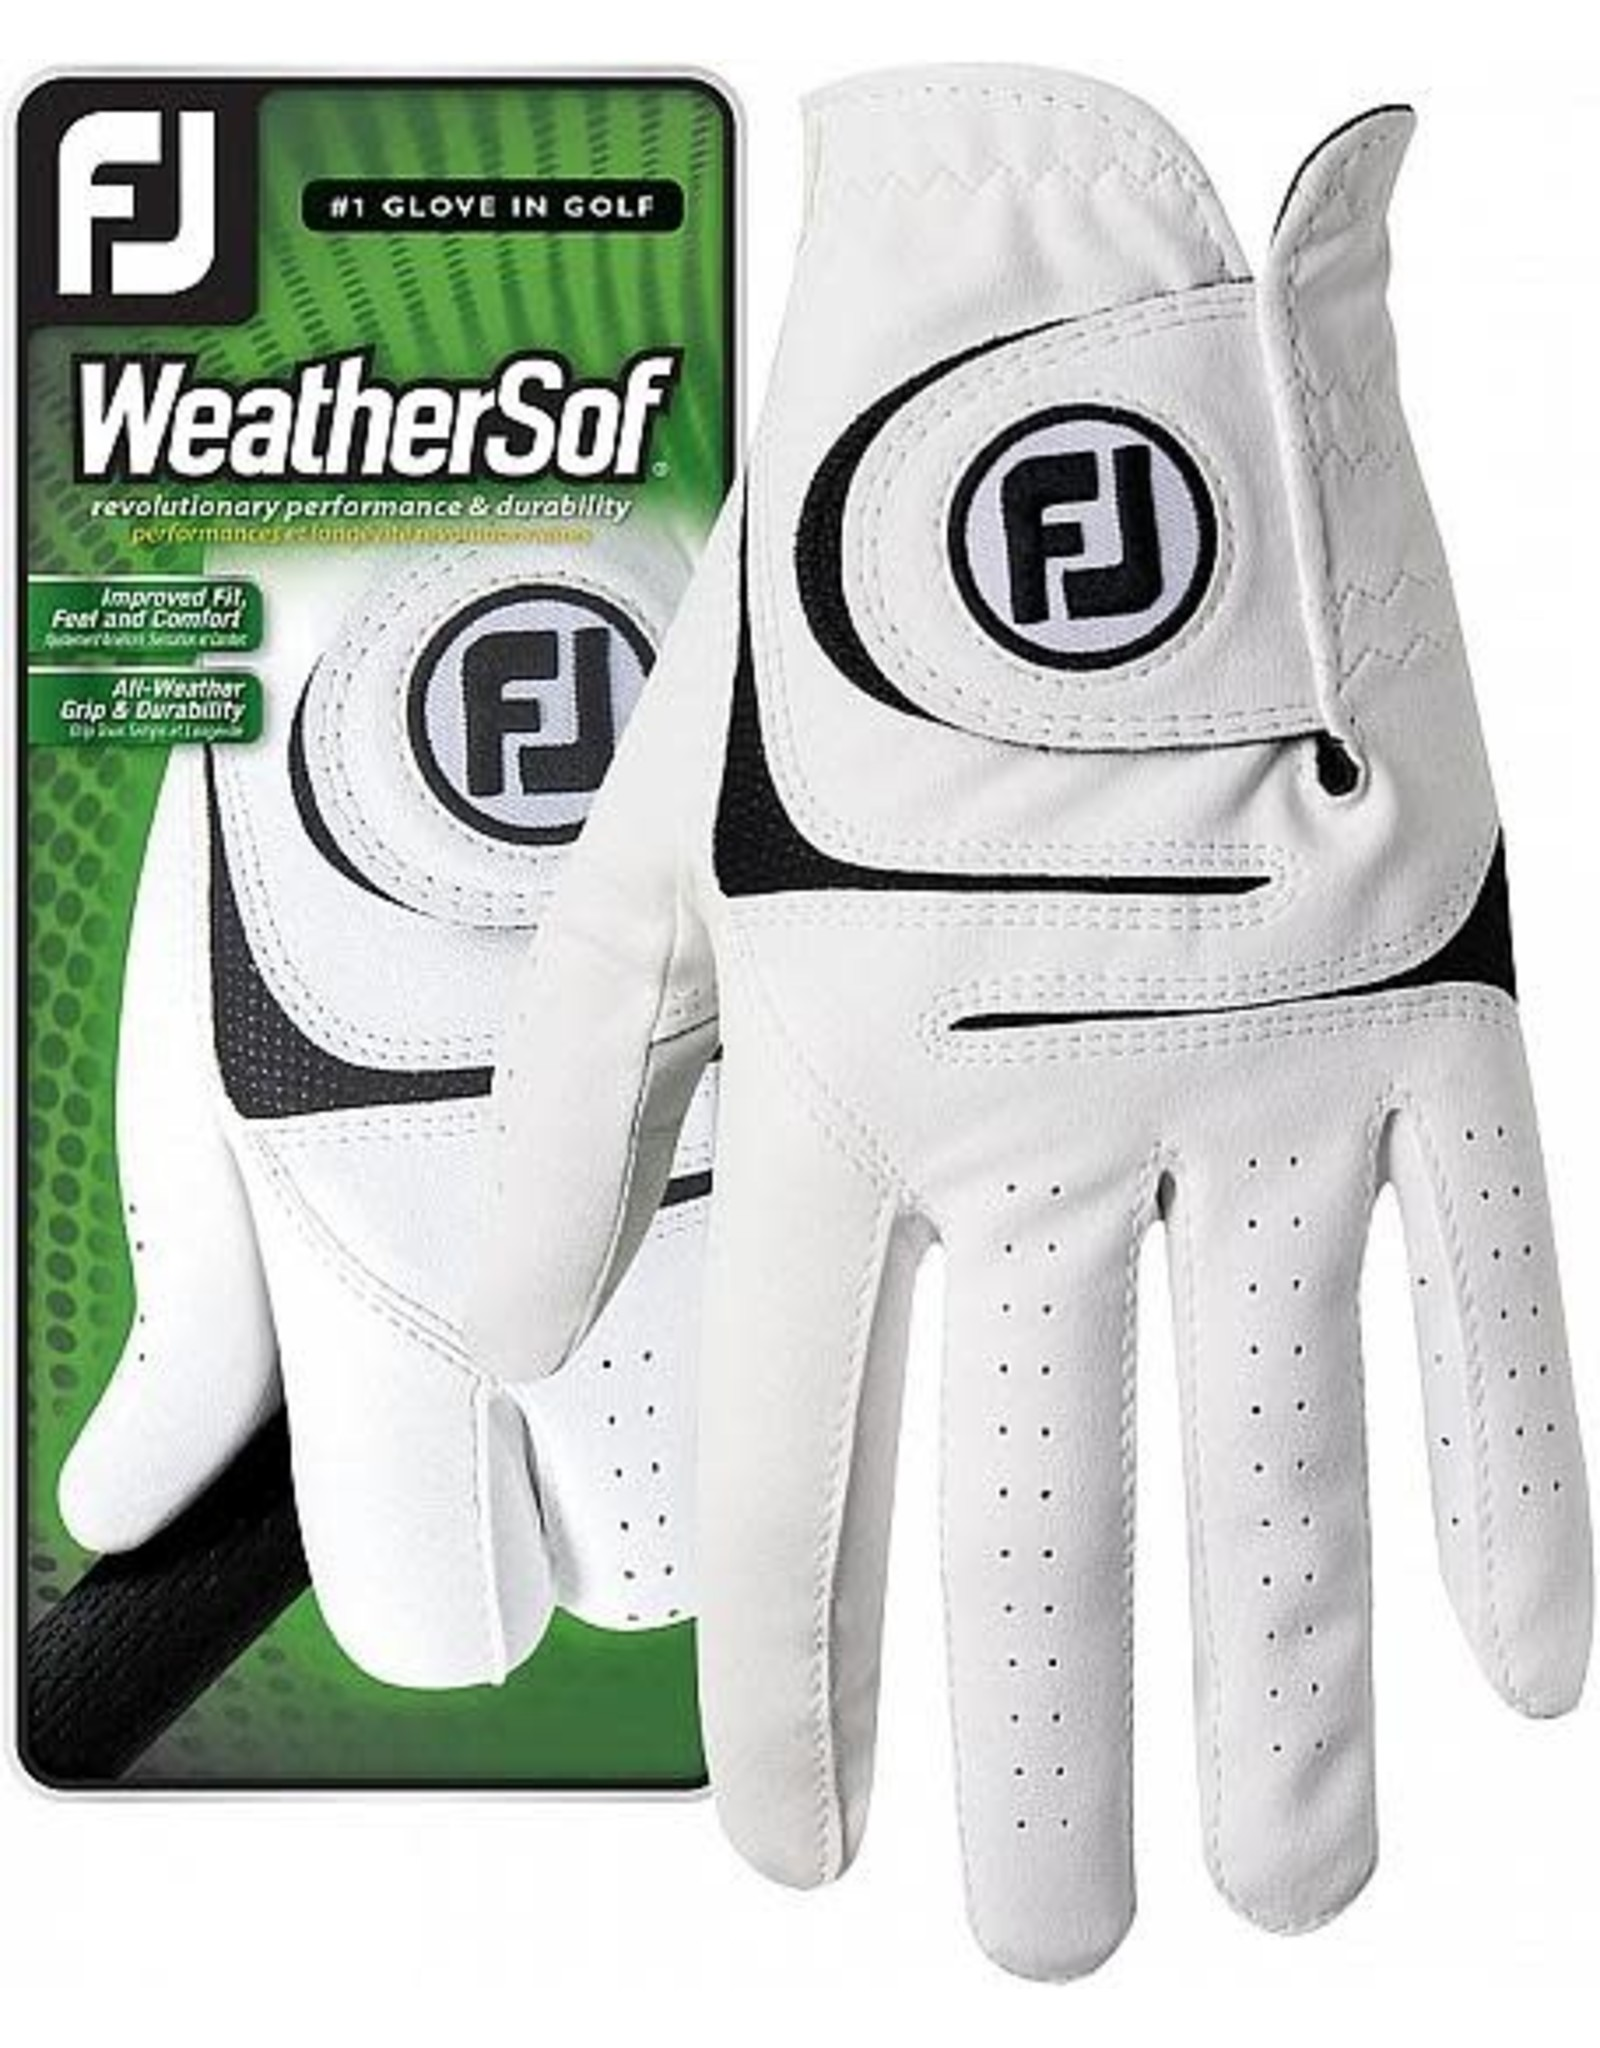 FJ FJ Weathersof Women's Gloves